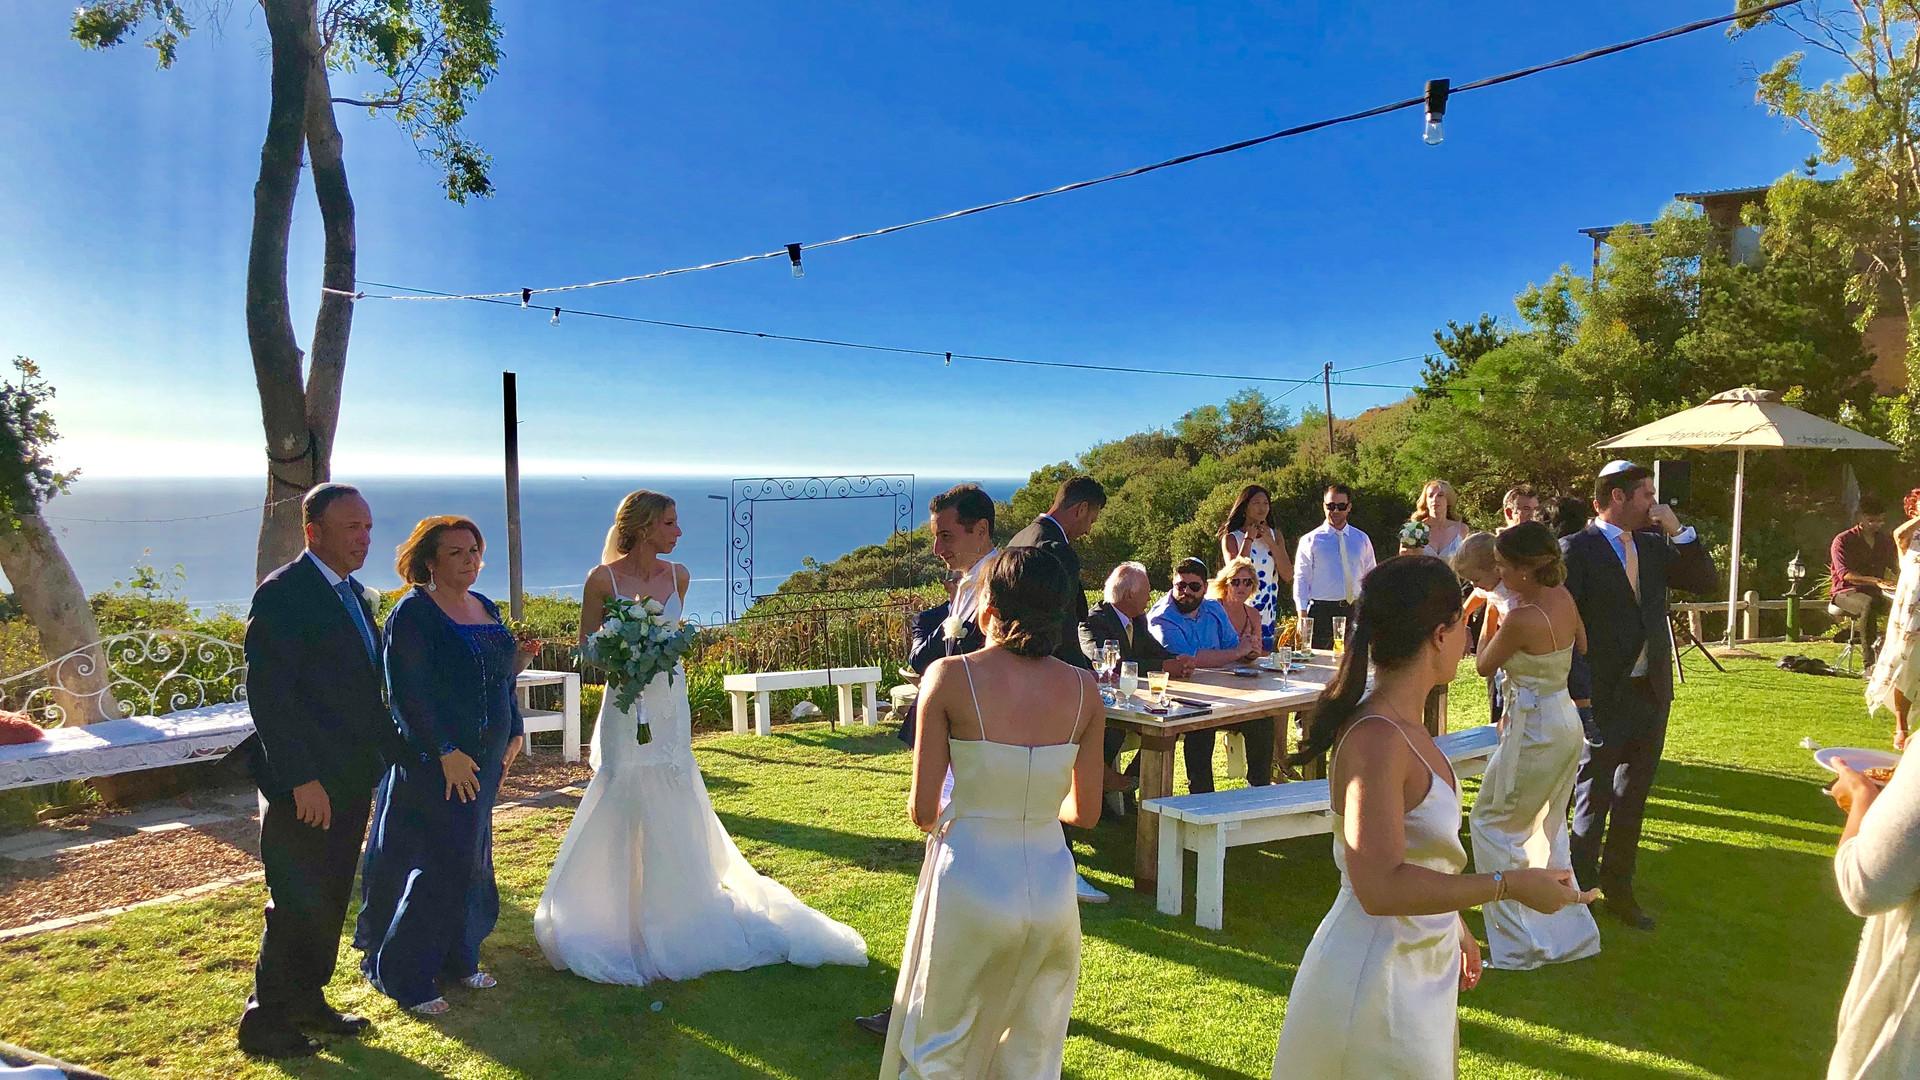 Llandudno Bridal Part5.jpg